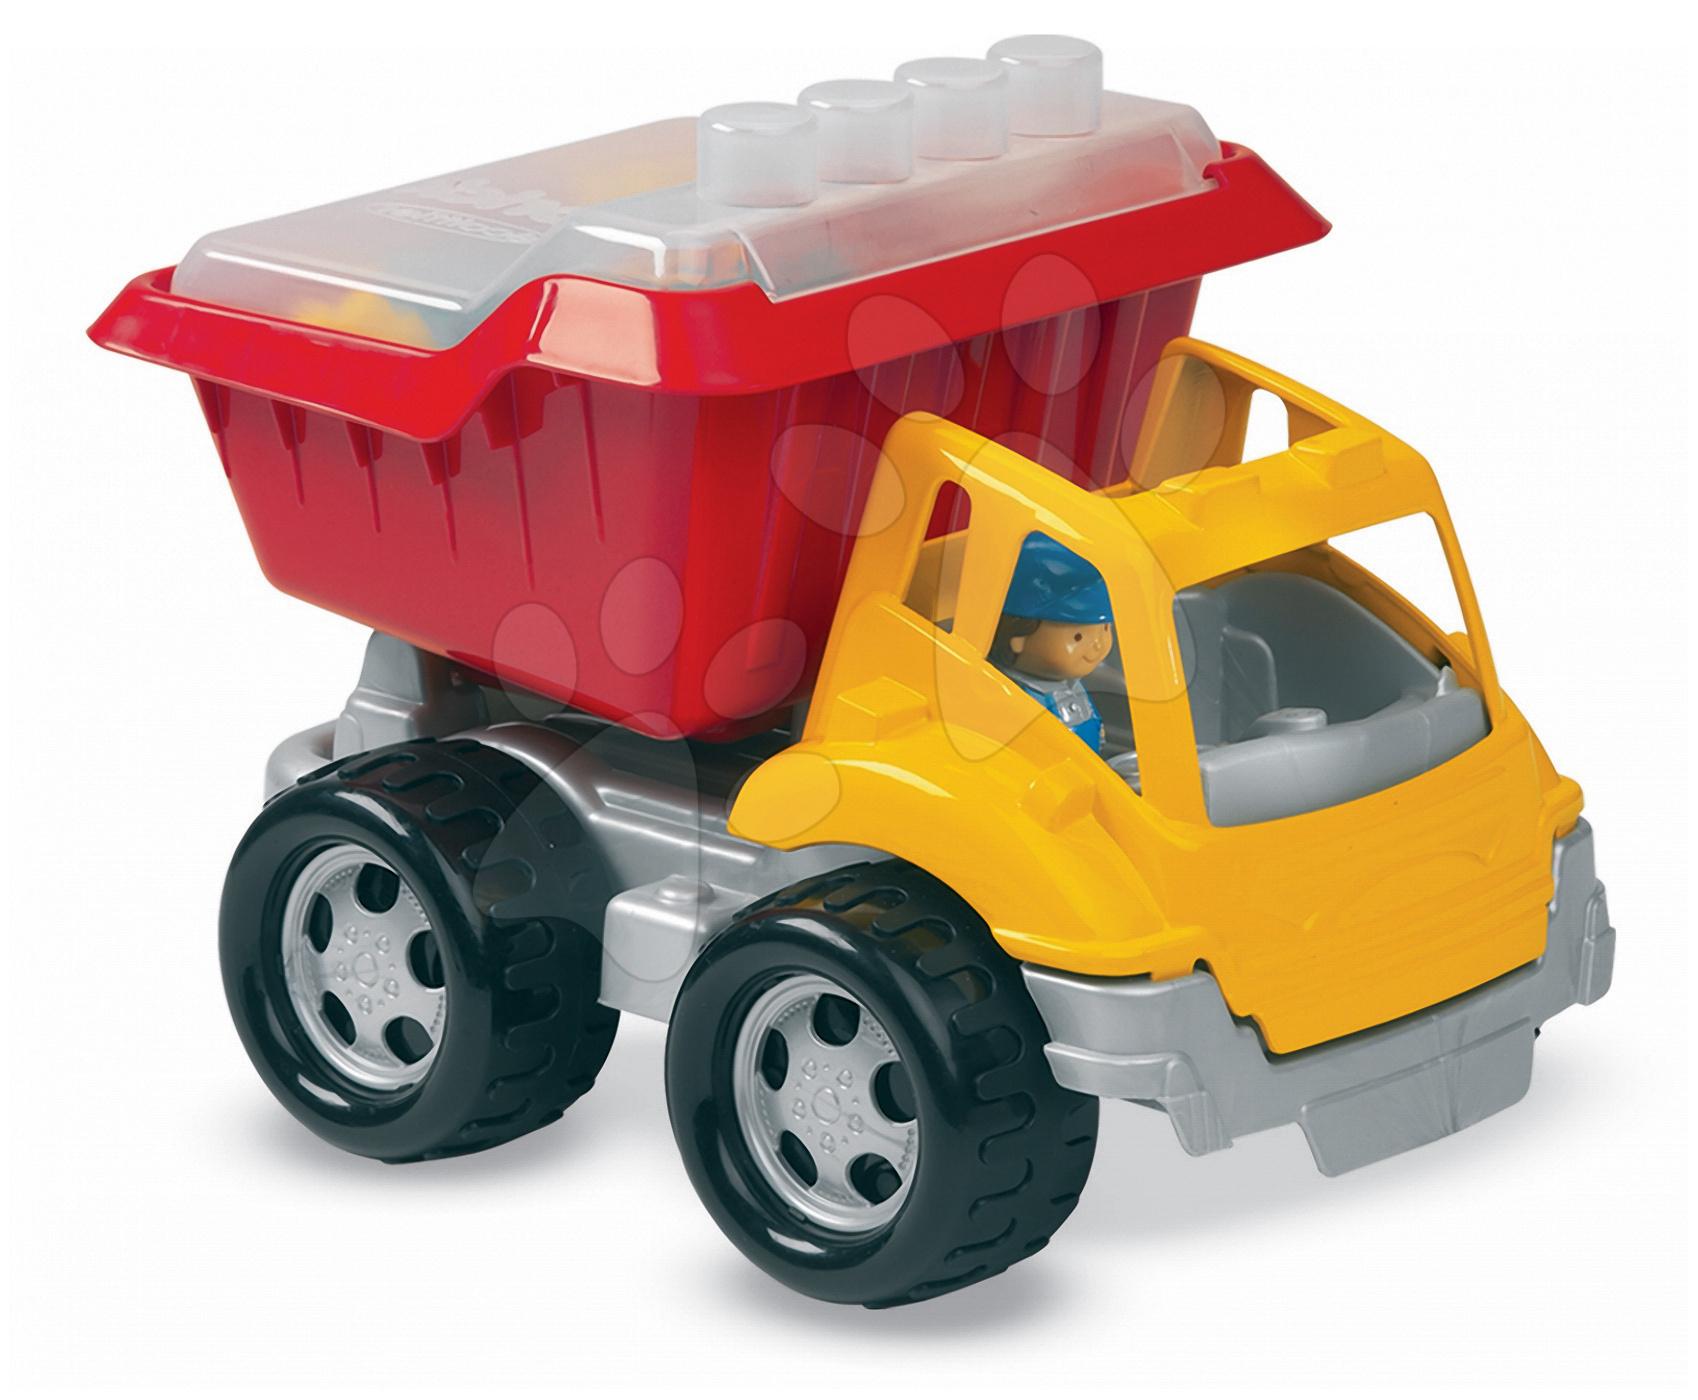 Joc de construit Abrick - camion cu cuburi Écoiffier de la 18 luni